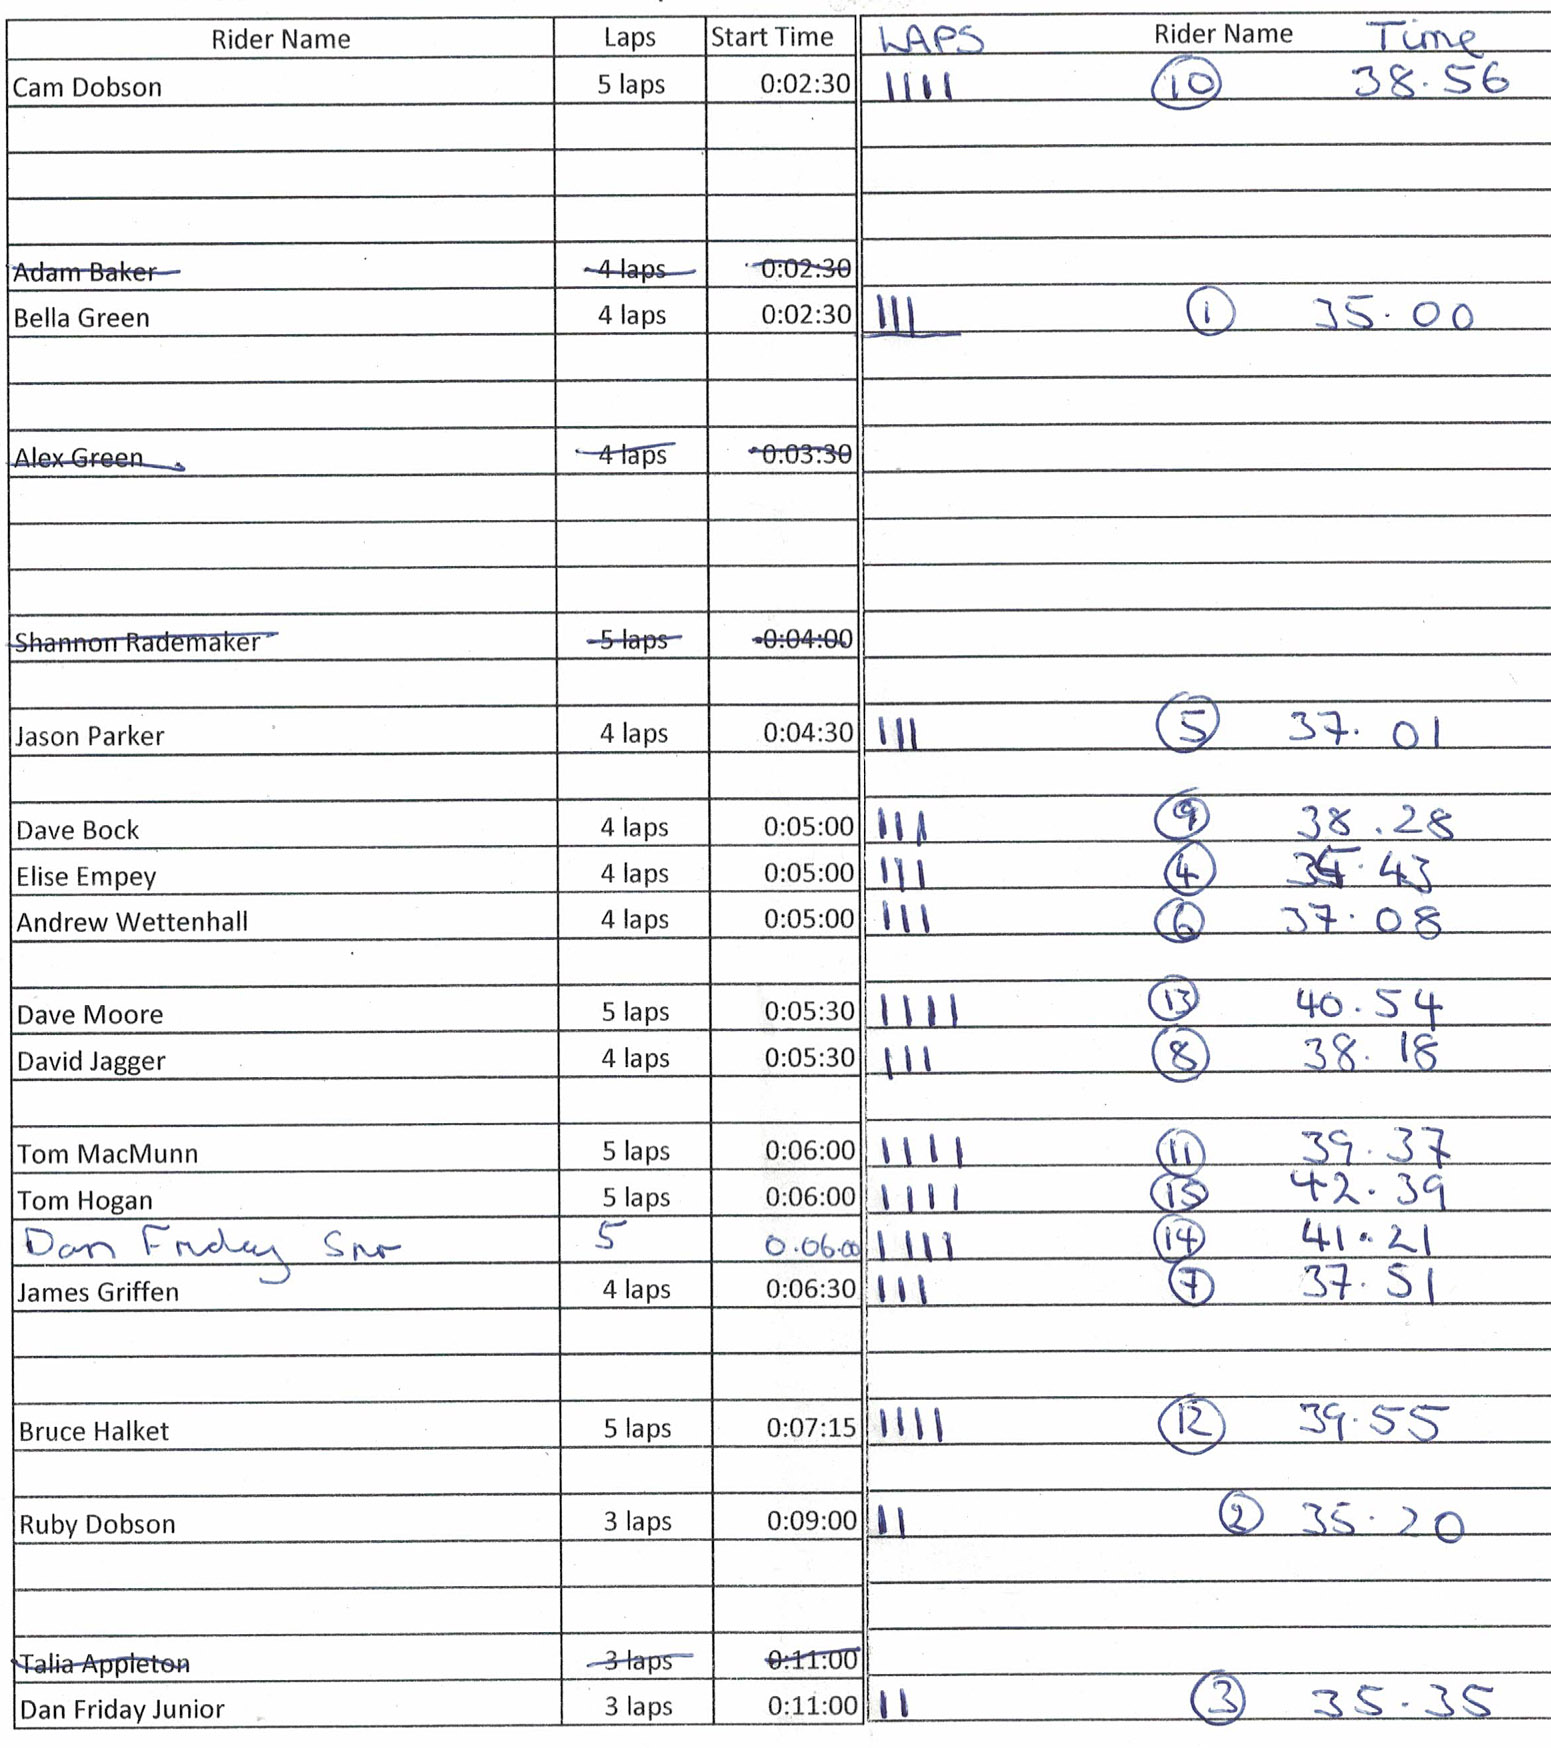 180305 Dirt Crits results.jpg